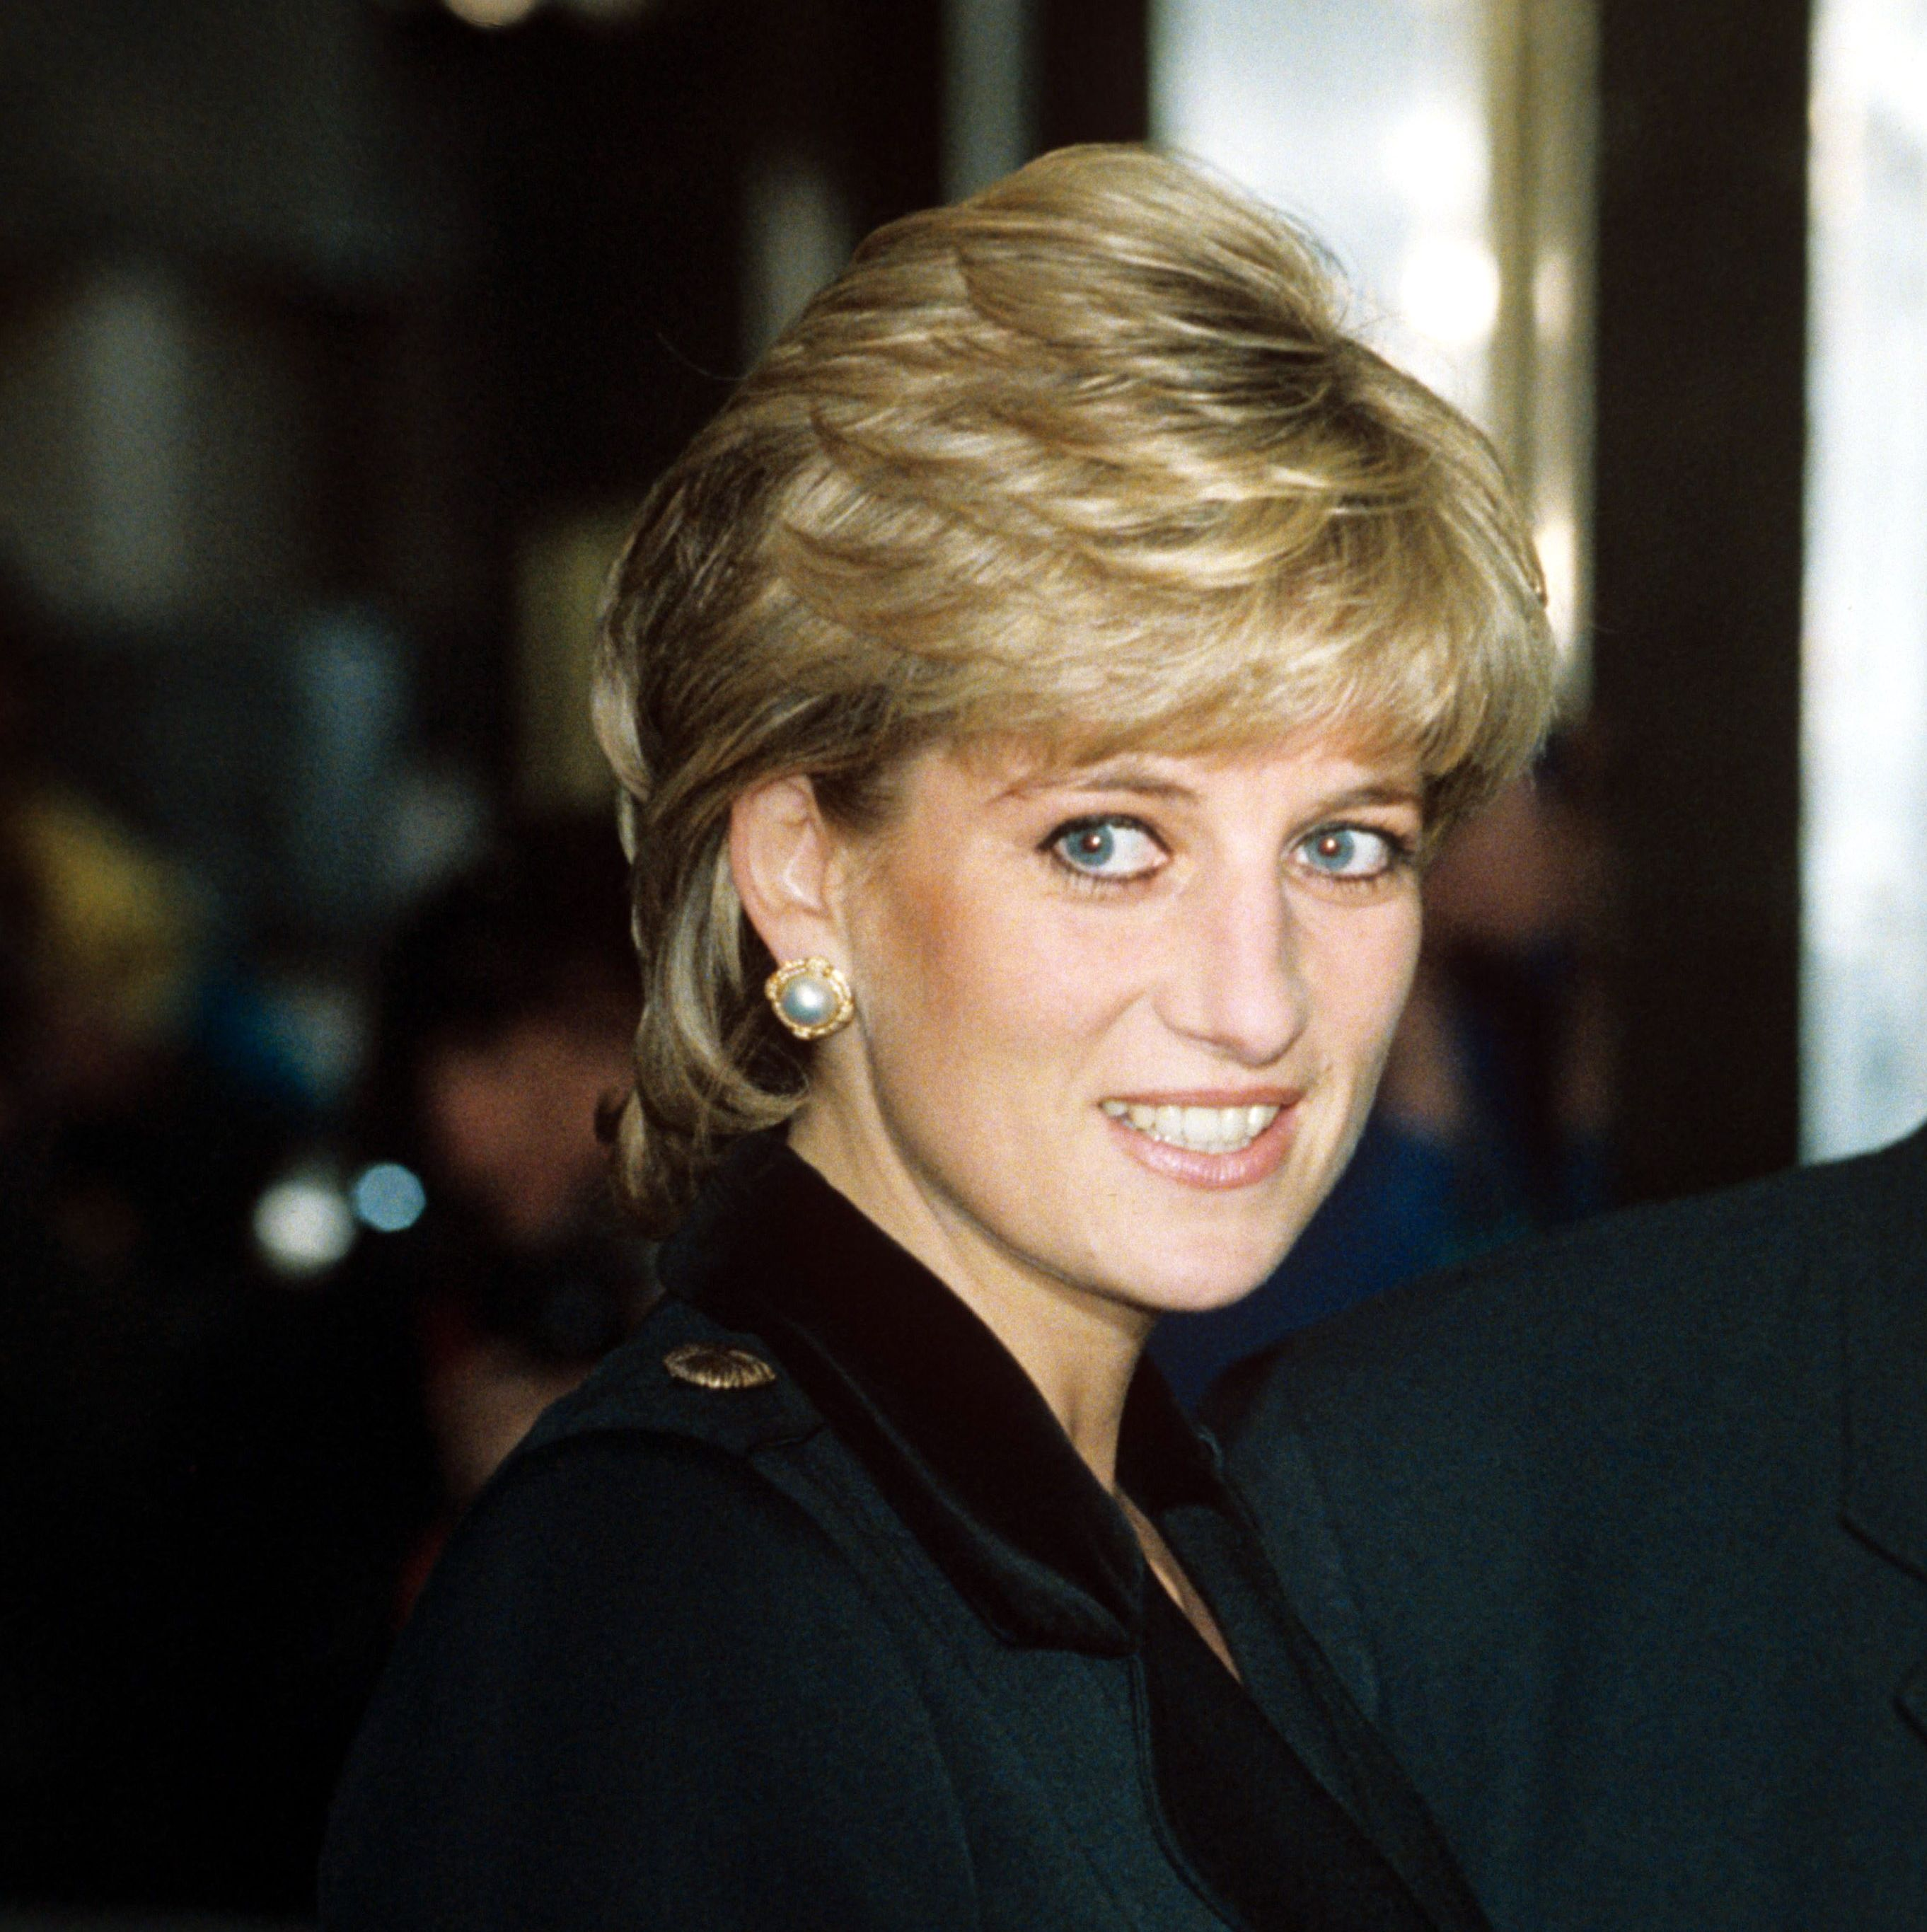 Royal Photographer Tim Rooke Shares His Favorite Memories of Princess Diana